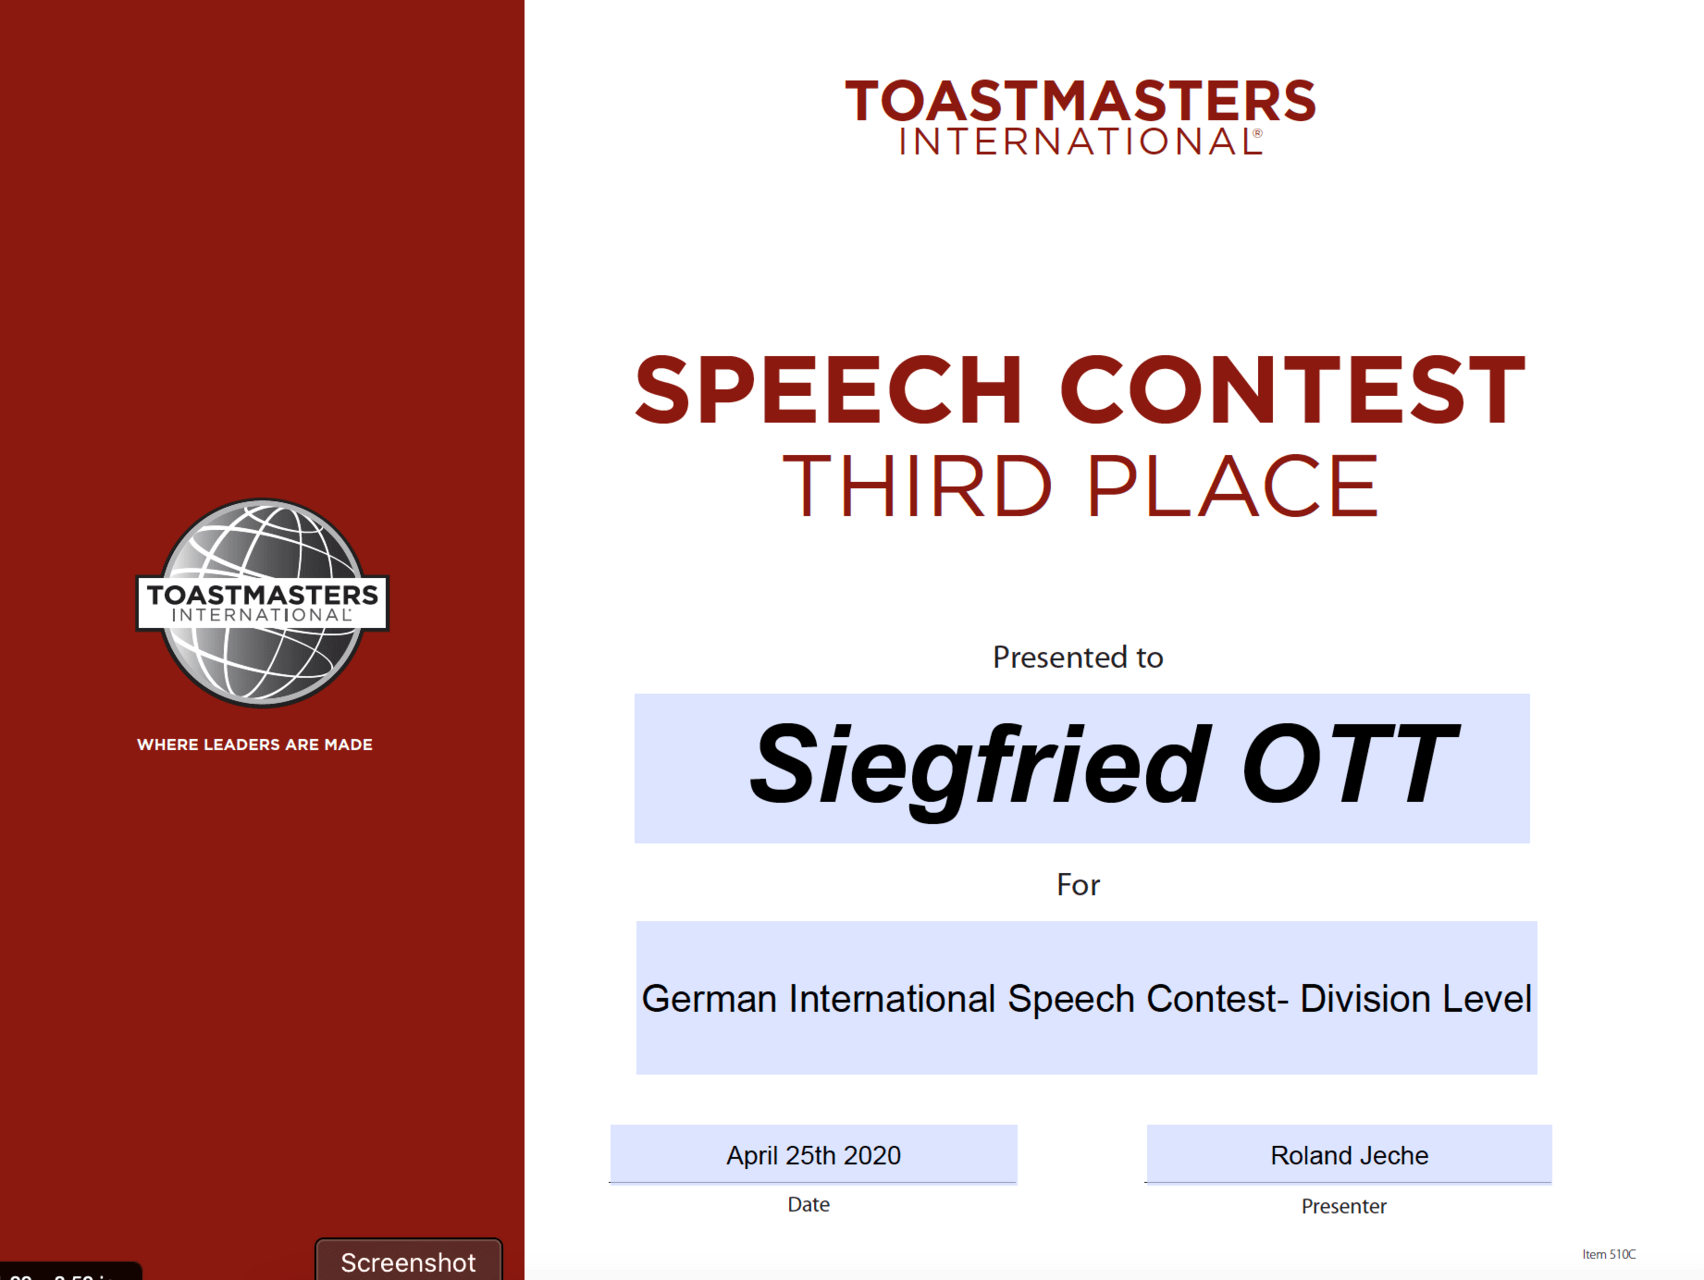 Toastmasters International Speech Contest